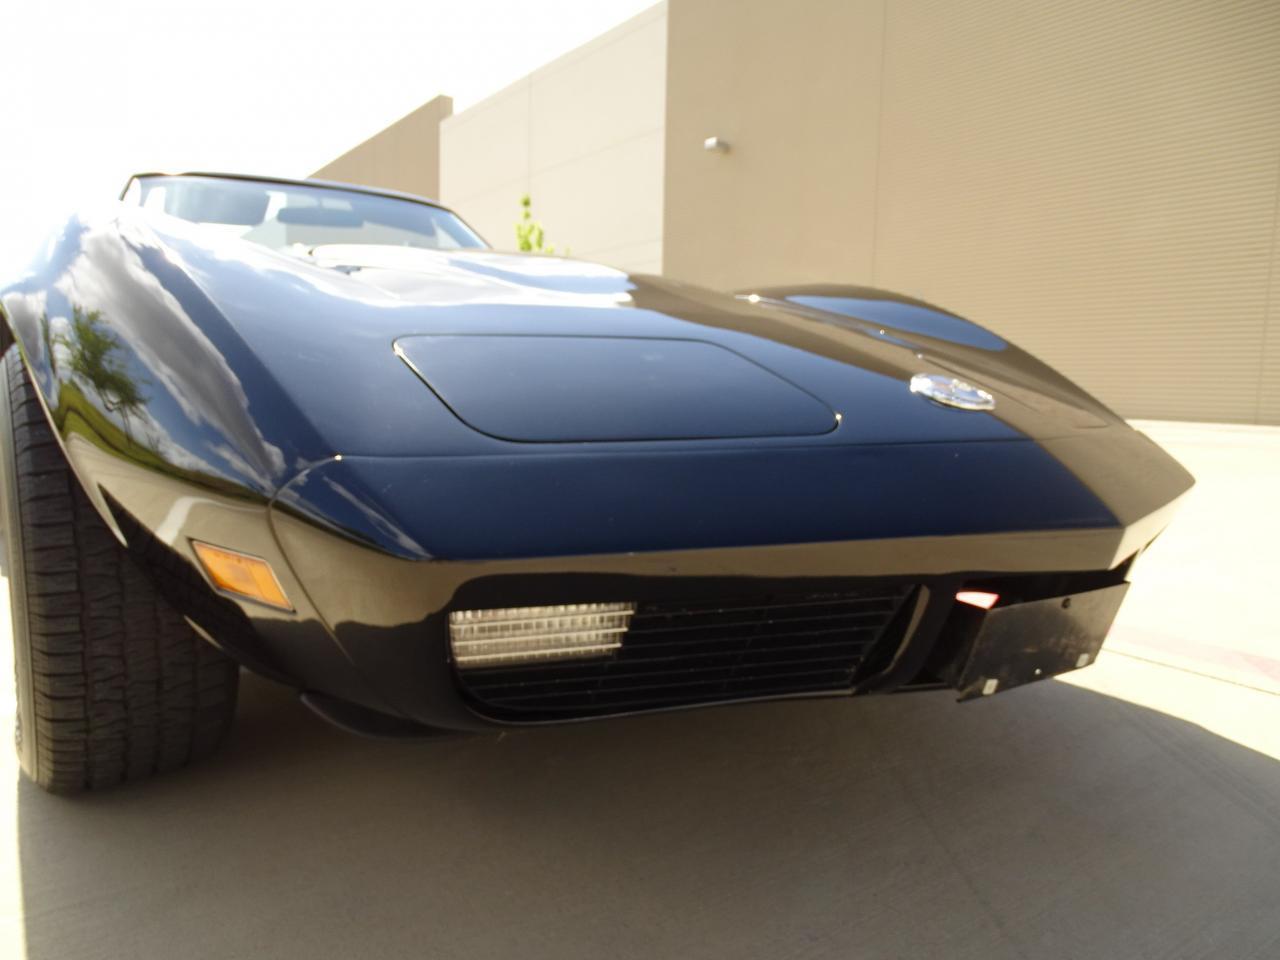 Large Picture of 1974 Chevrolet Corvette located in DFW Airport Texas - LAOQ